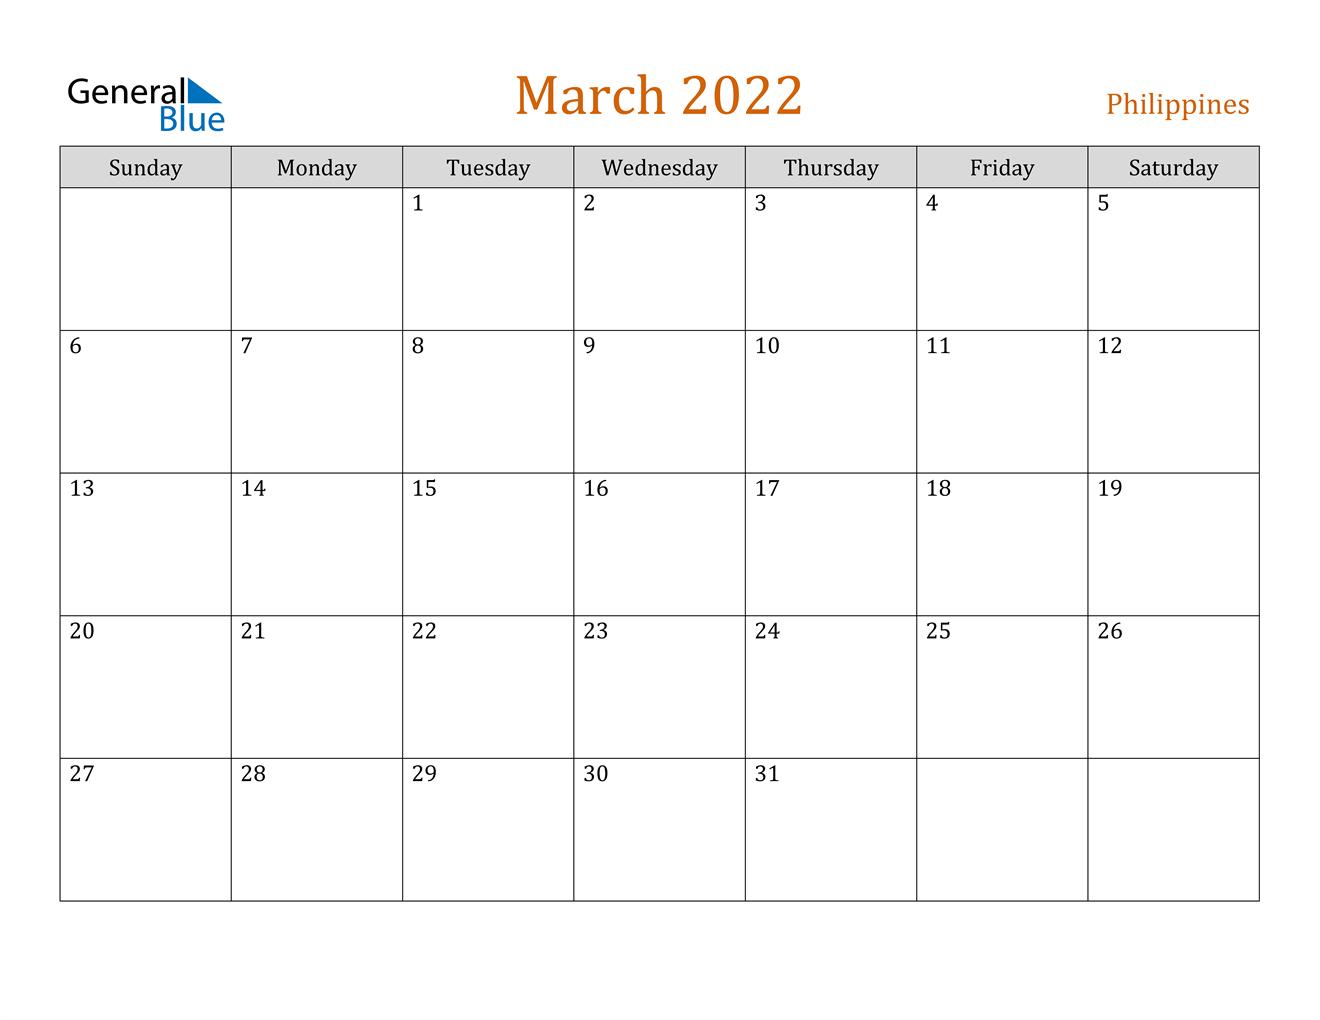 March 2022 Calendar - Philippines